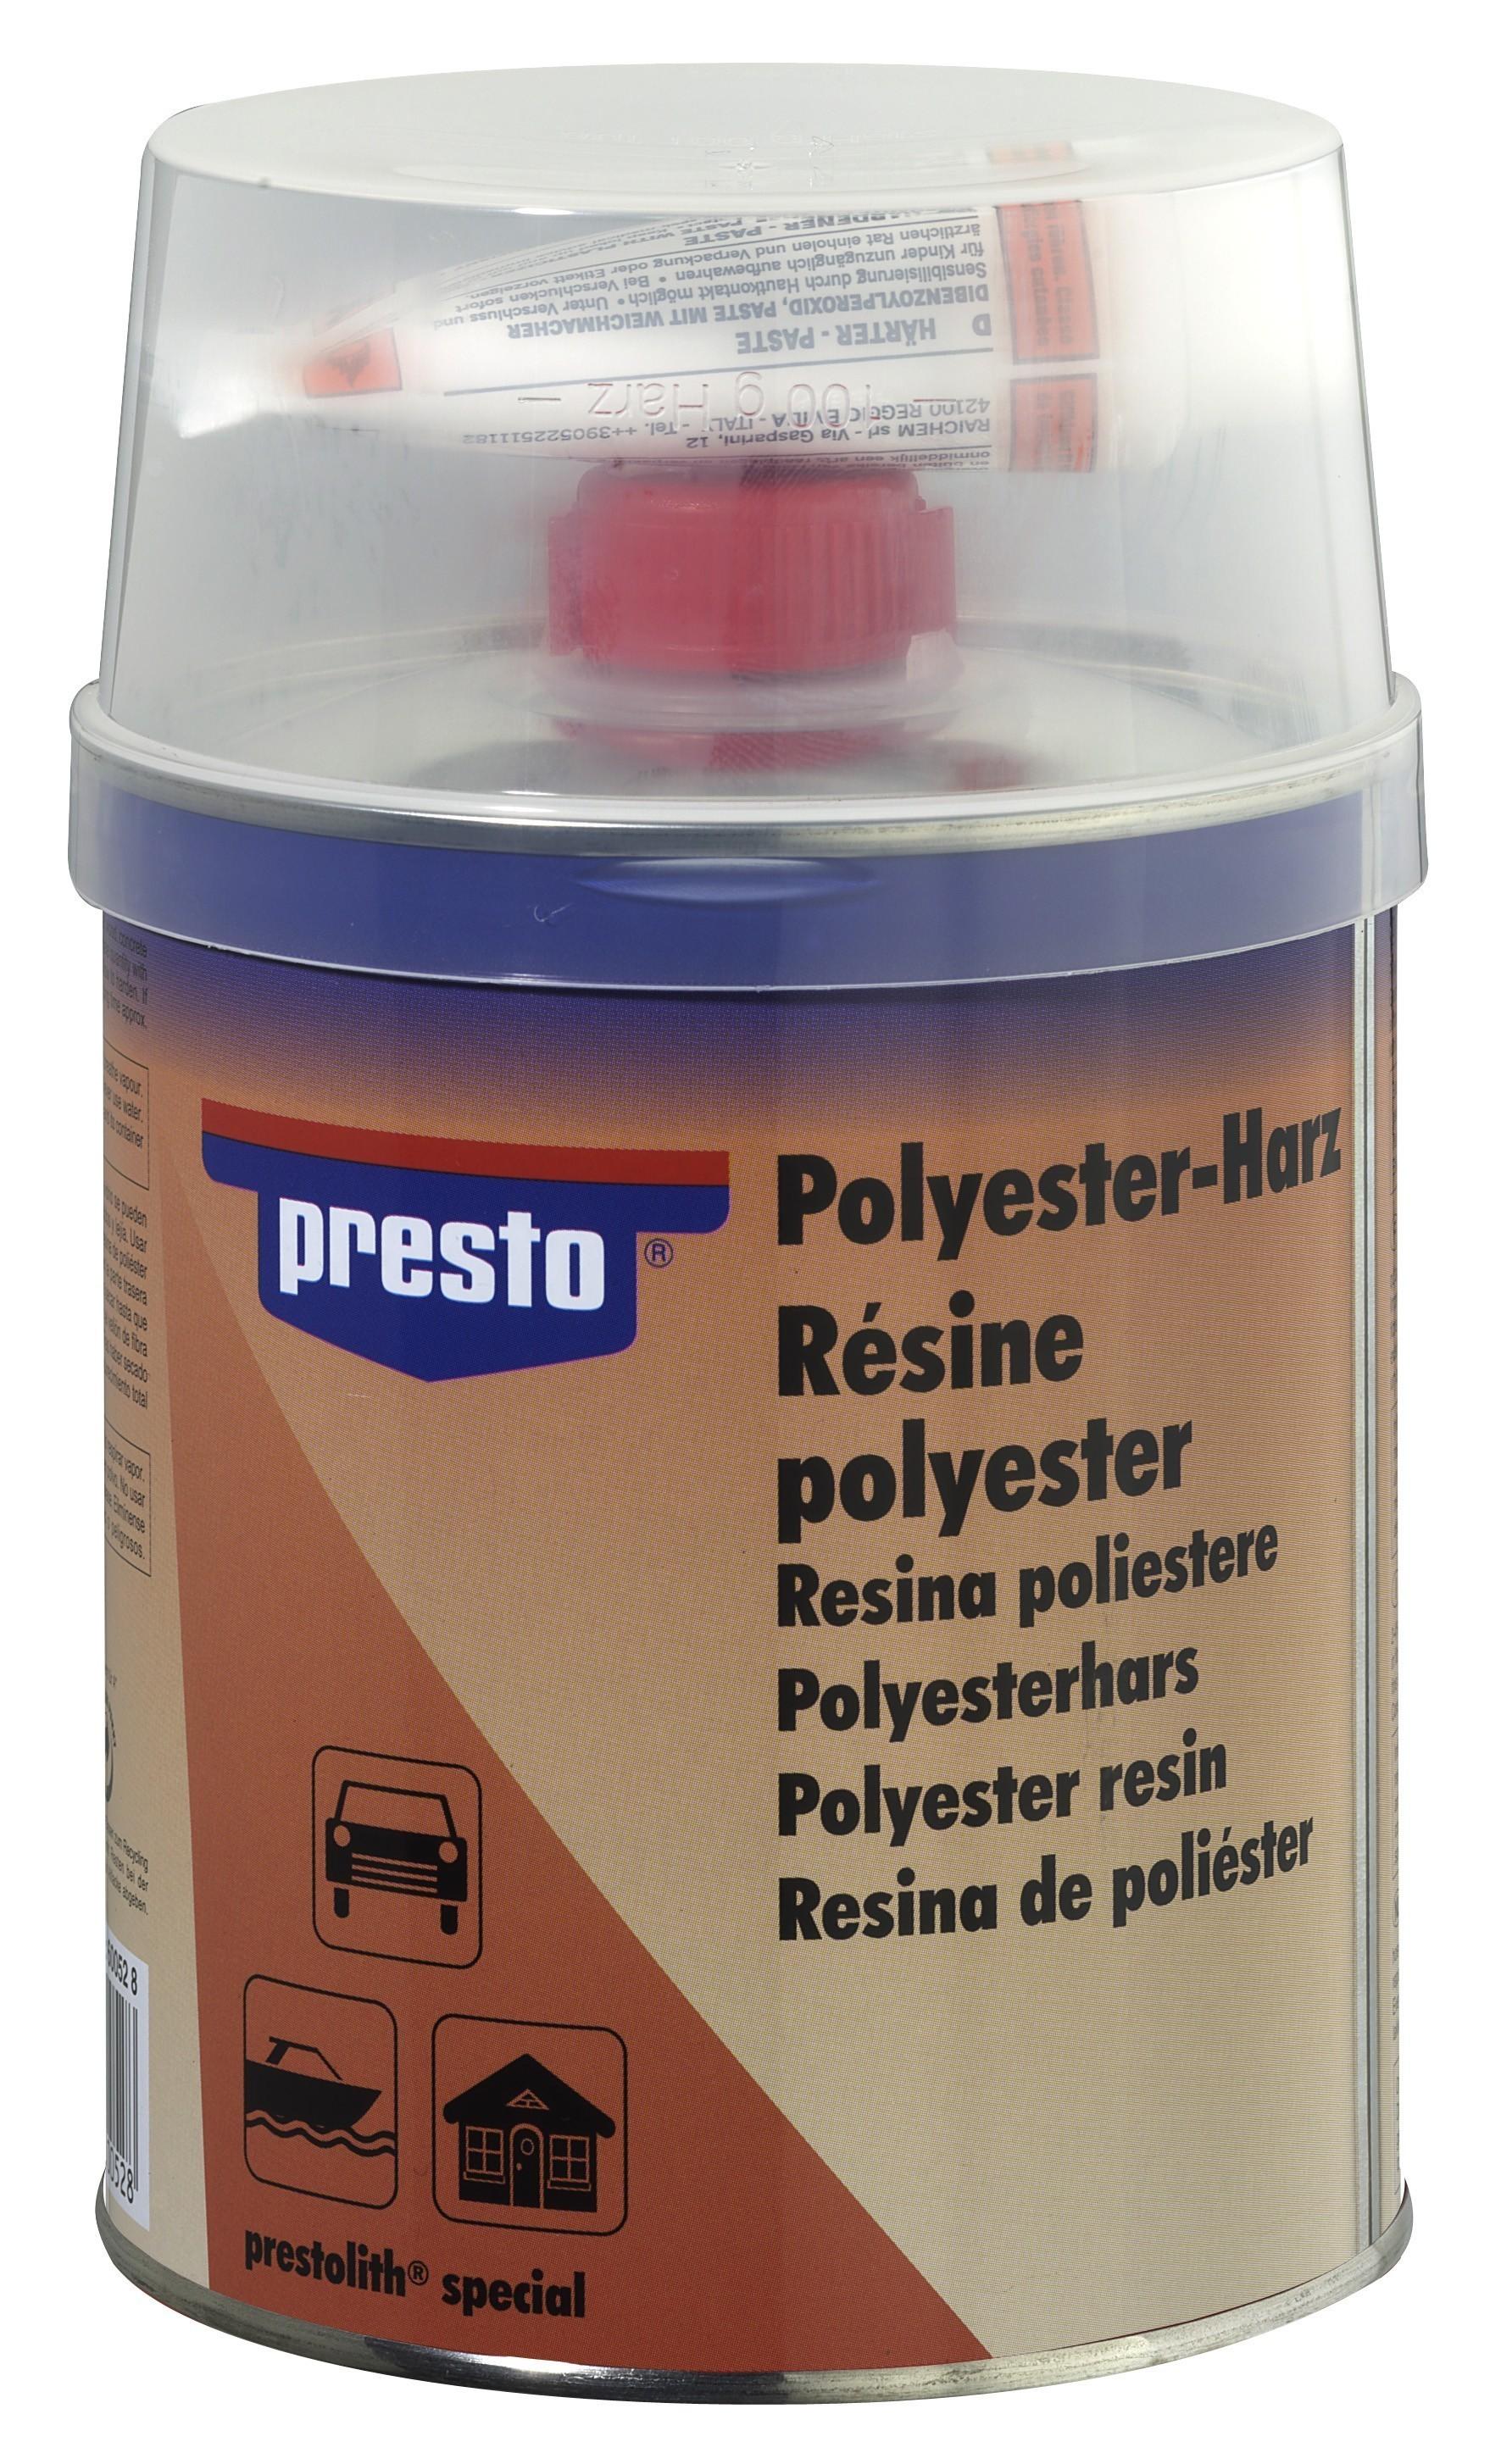 Prestolith special Polyester-Harz 1000g Bild 1